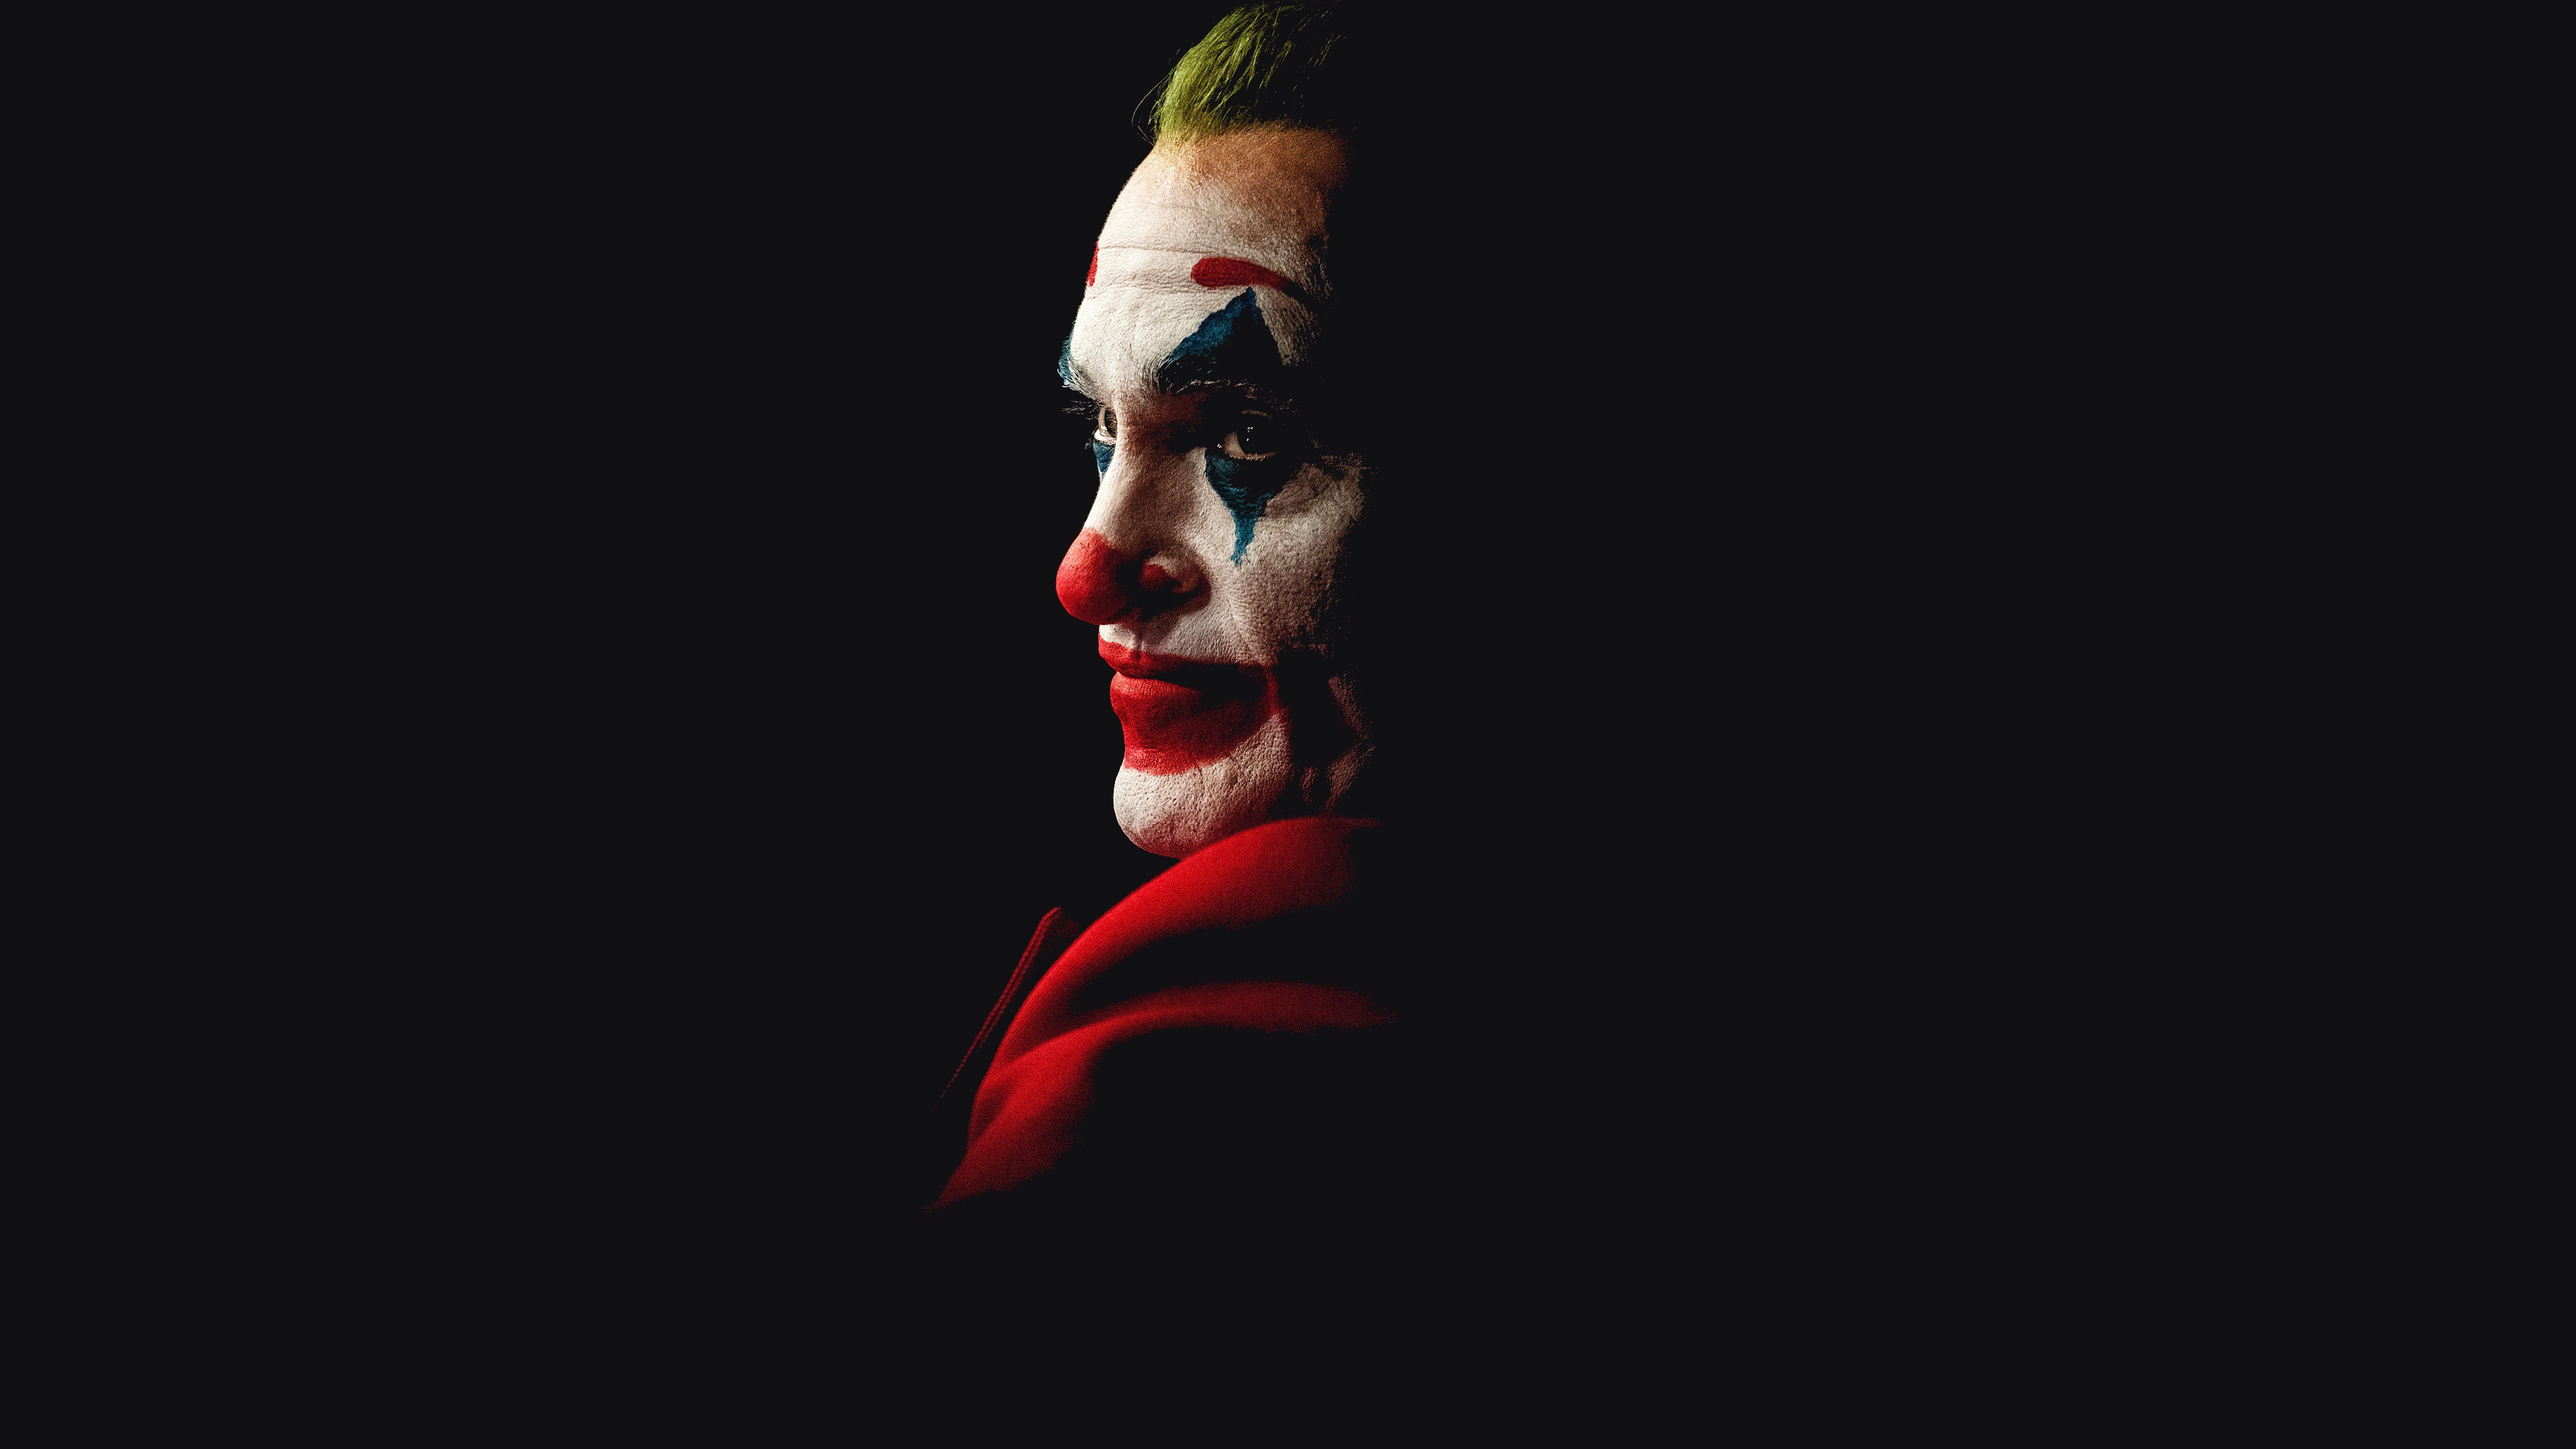 Joker 2019 Movie Joker Joaquin Phoenix 8k Wallpaper Hdwallpaper Desktop Joker Wallpapers Joker Hd Wallpaper Joker Full Movie